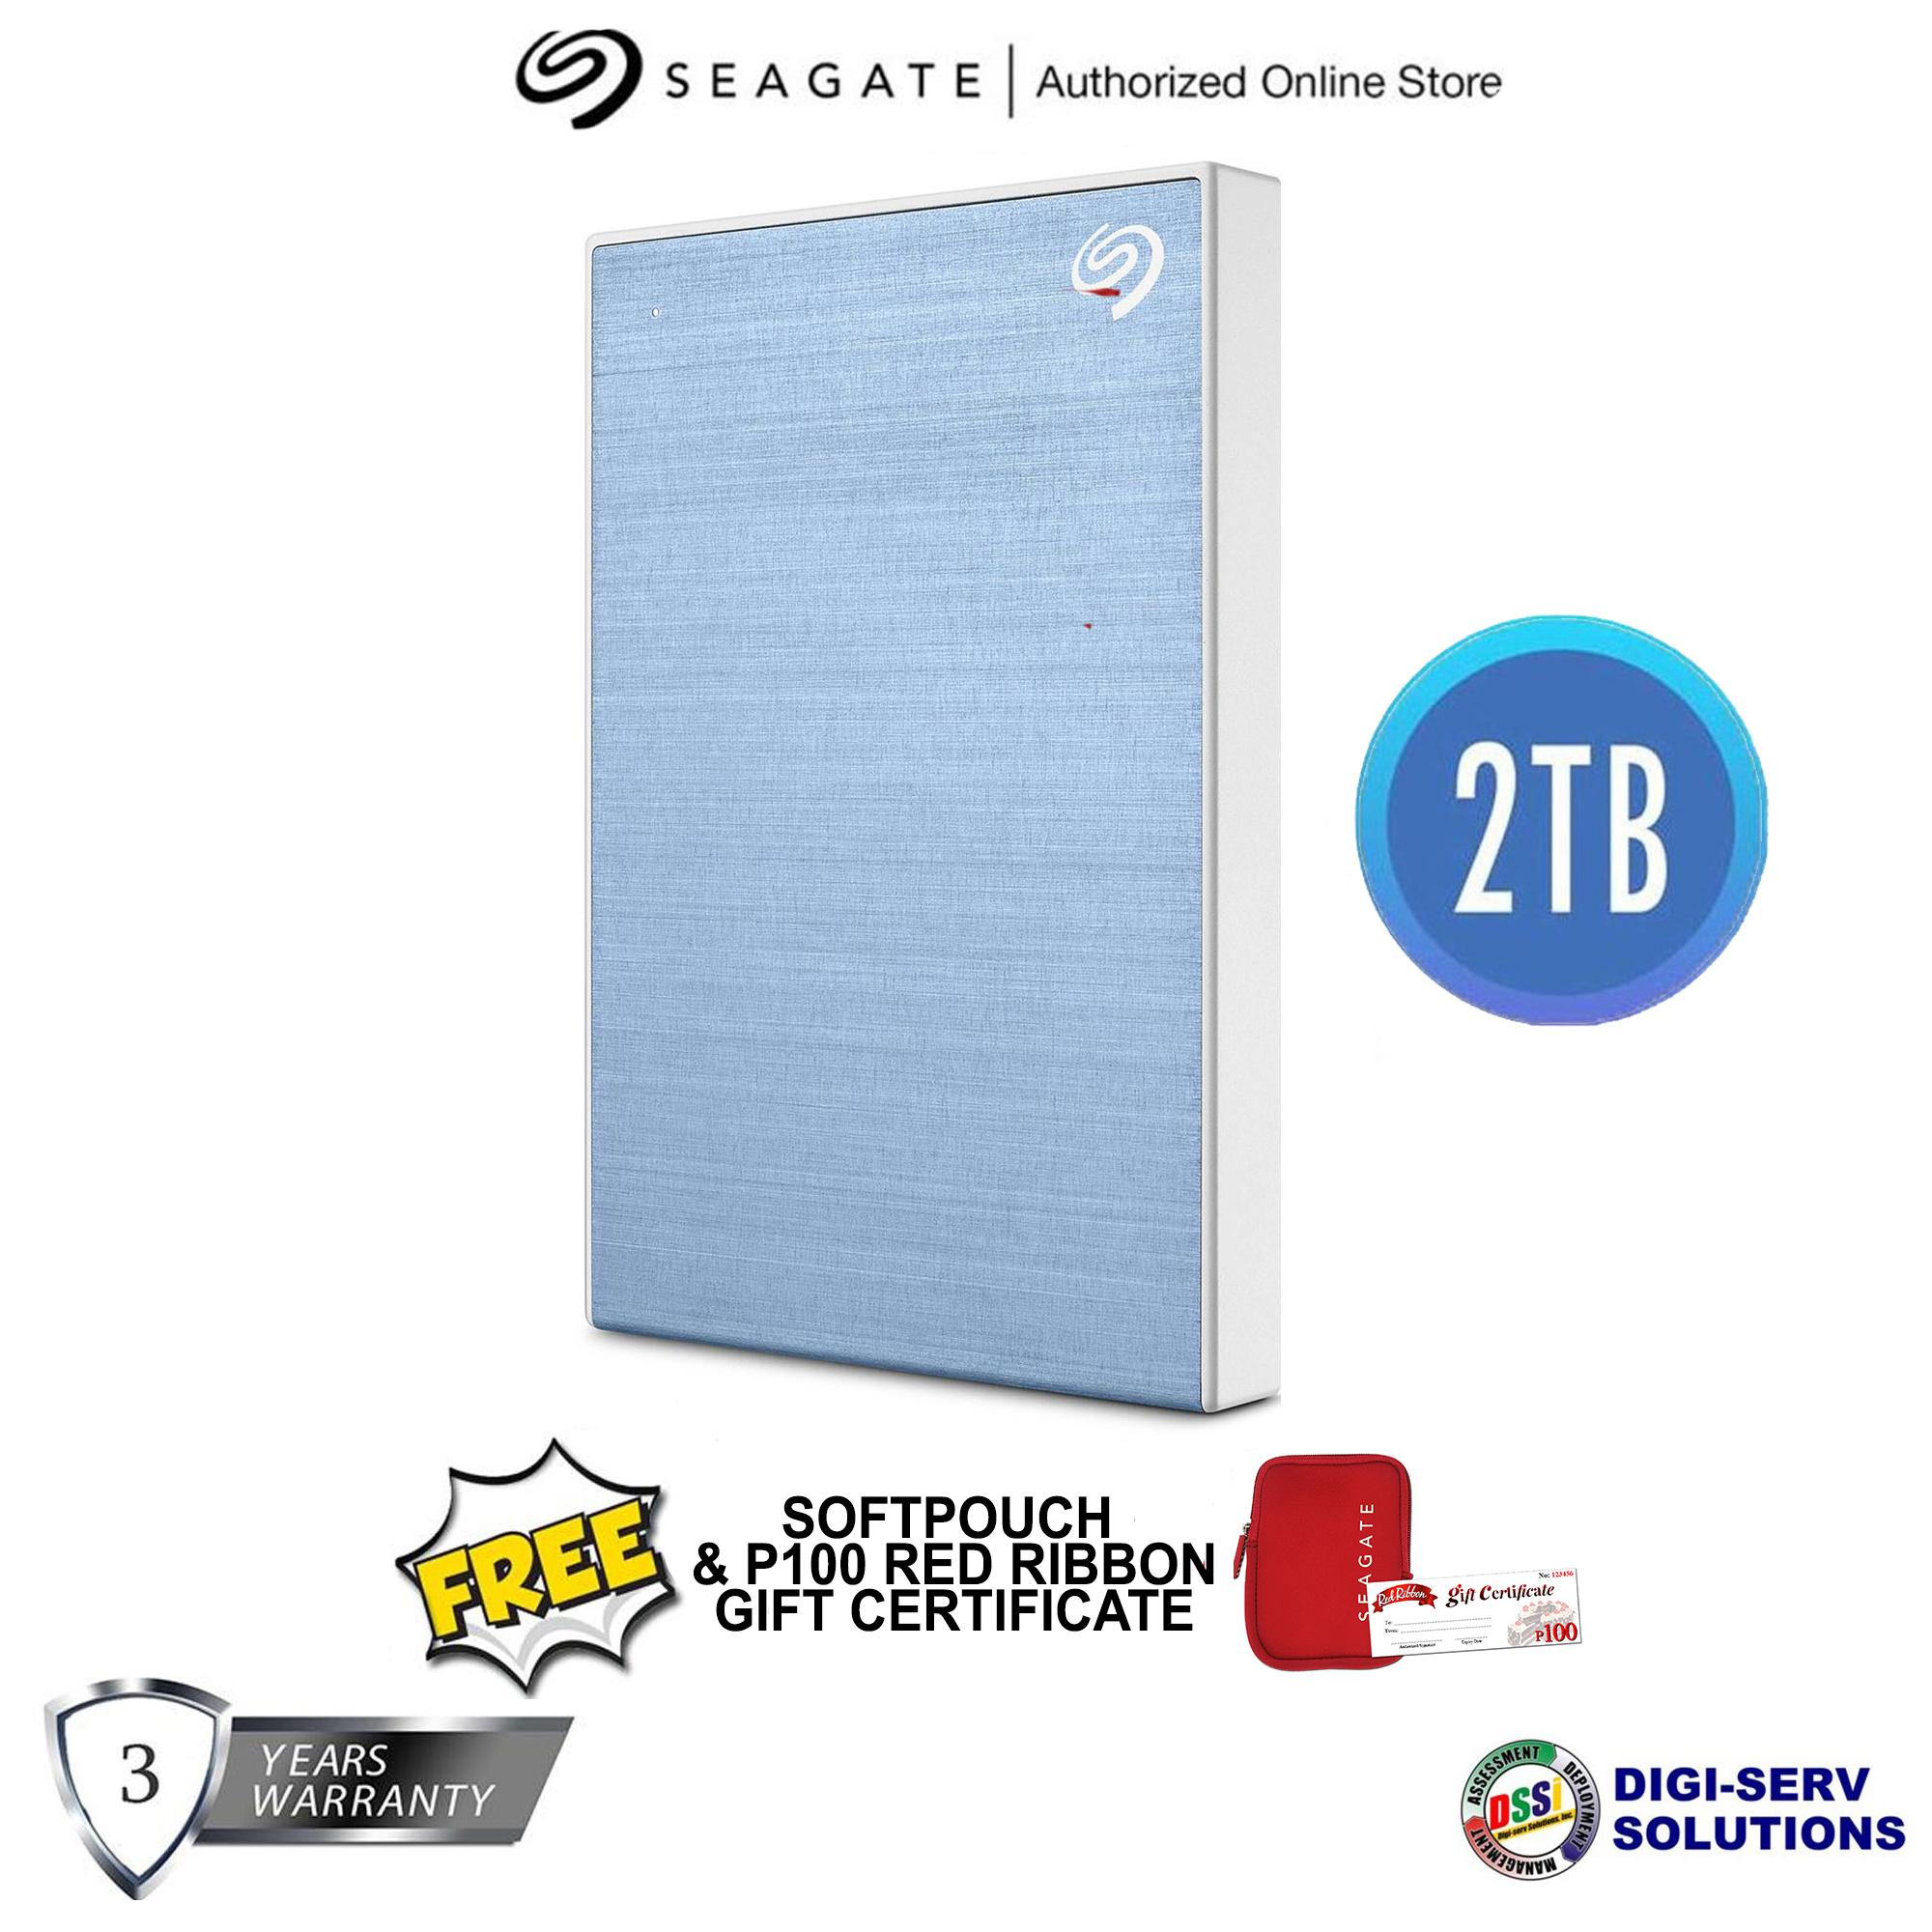 Backup Plus Slim 2TB External USB 3.0//2.0 Portable Hard Drive Blue Seagate